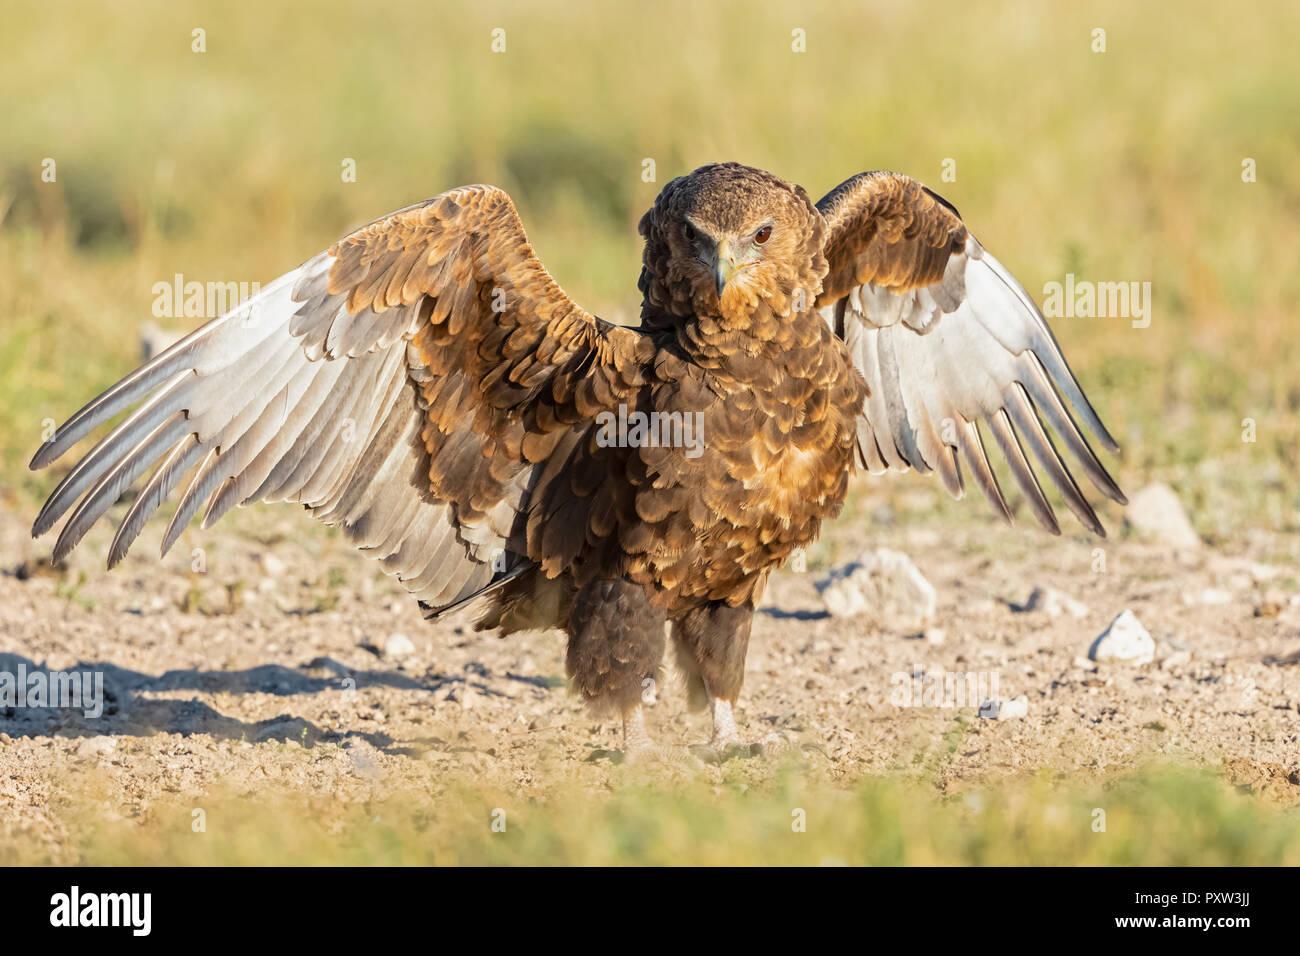 Botswana, Kgalagadi Transfrontier National Park, Mabuasehube Game Reserve, Bataleur eagle, young animal, Terathopius ecaudatus Stock Photo